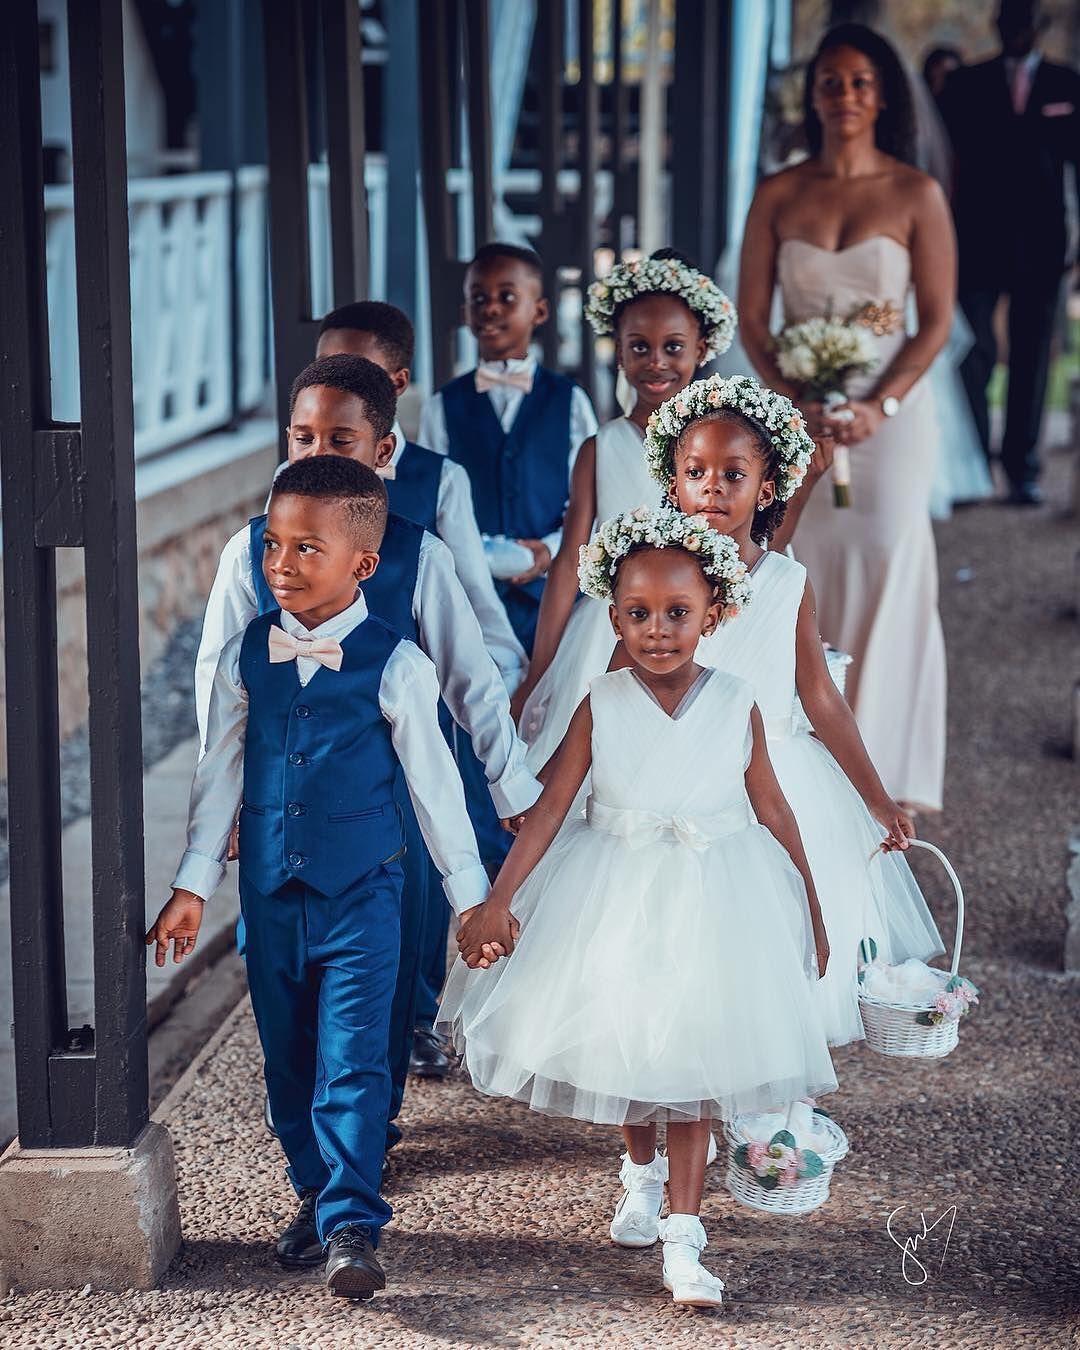 Follow Us Signature Bride On Instagram And Twitter And On Facebook Signature Bride Magazine Black Bride African American Weddings Black Bridesmaid Dresses